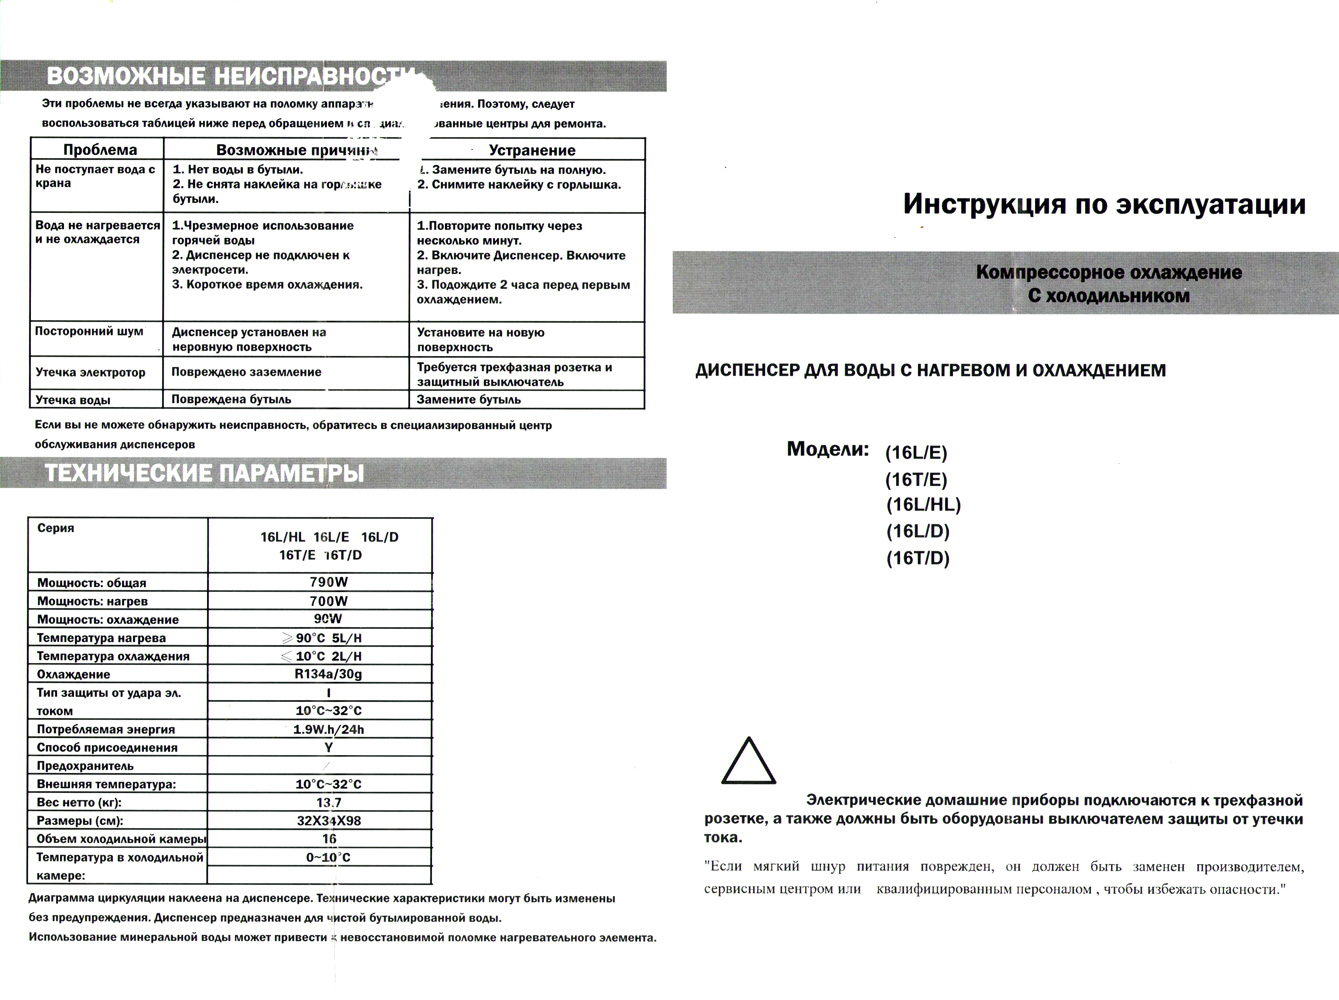 кулер Aqua Work 16-T/DE паспорт